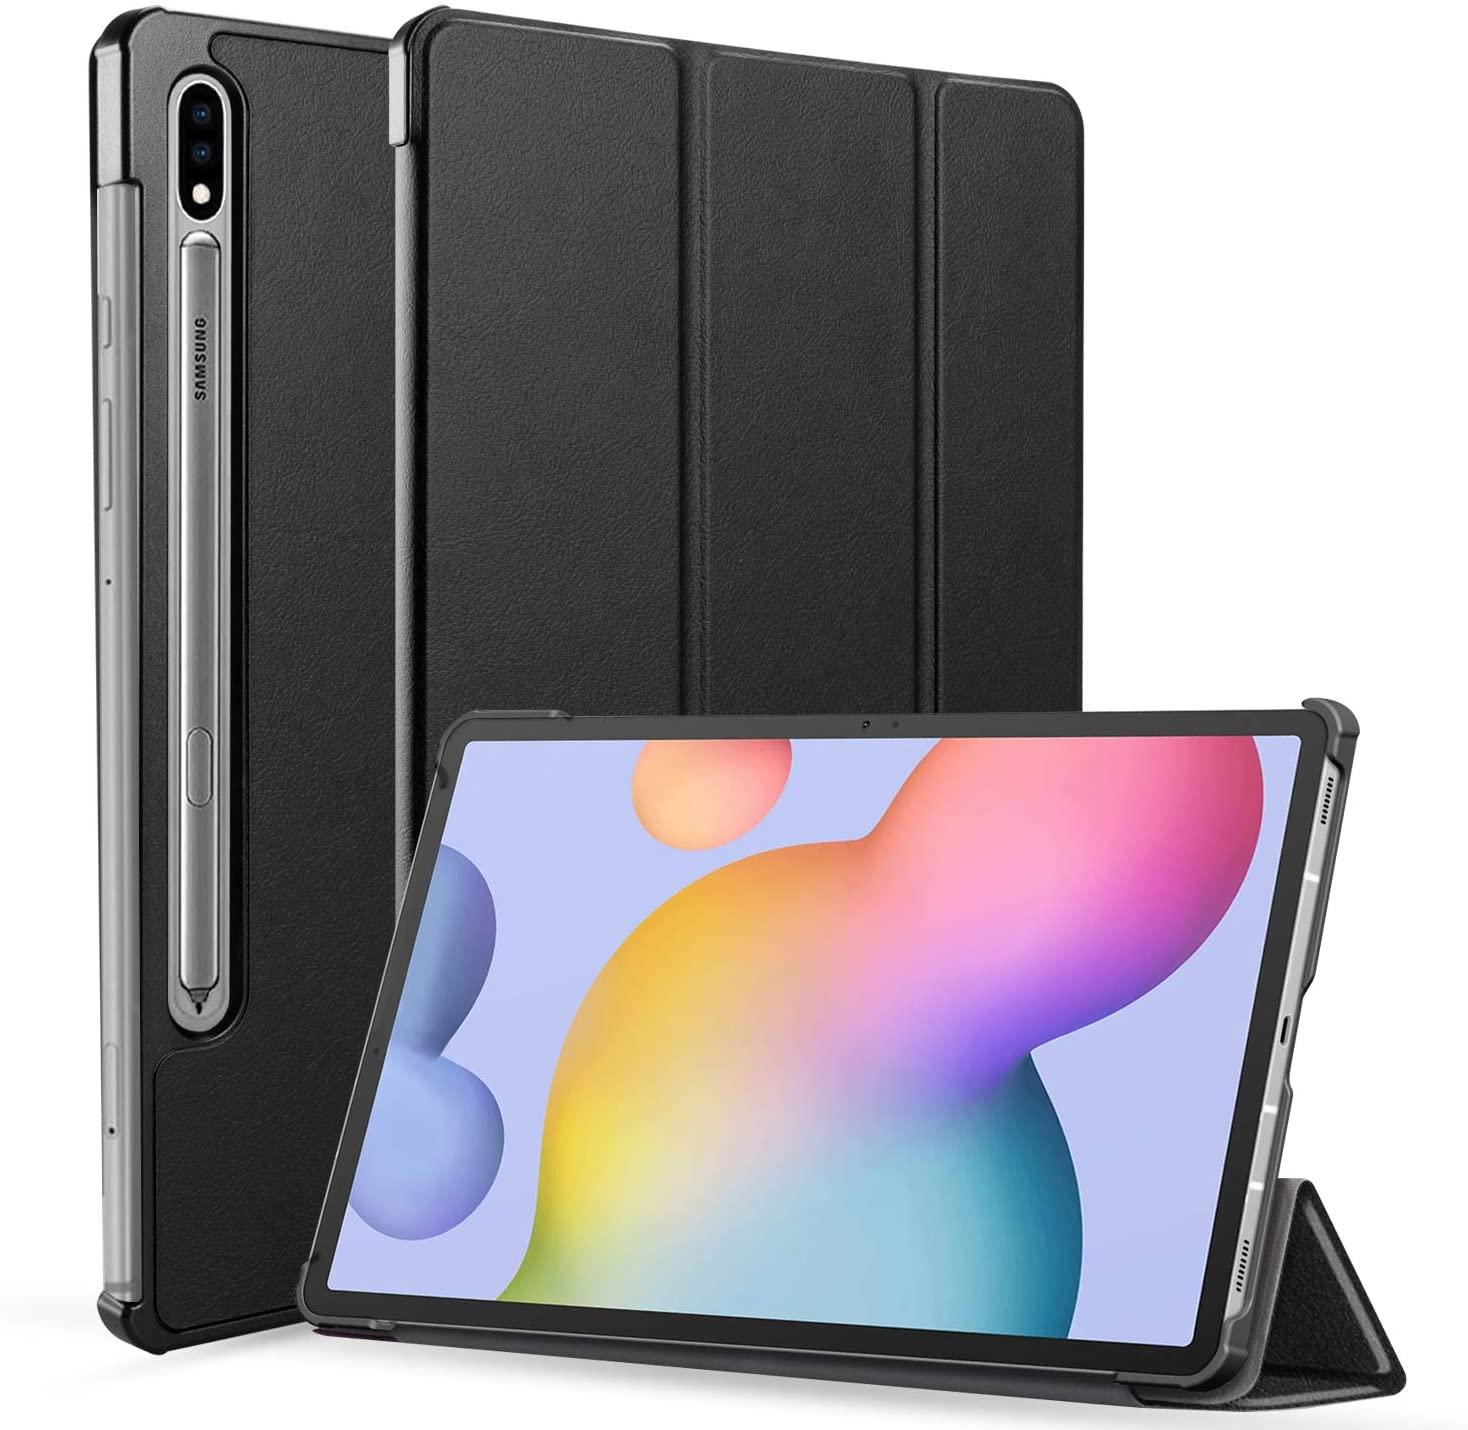 Neepanda Case for Samsung Galaxy Tab S7 11 Inch 2020, Slim Tri-Fold Shell Case Cover for Samsung Galaxy Tab S7 11 Inch 2020 Release Model SM-T870(Wi-Fi) SM-T875(LTE), [Auto Wake/Sleep] - Black